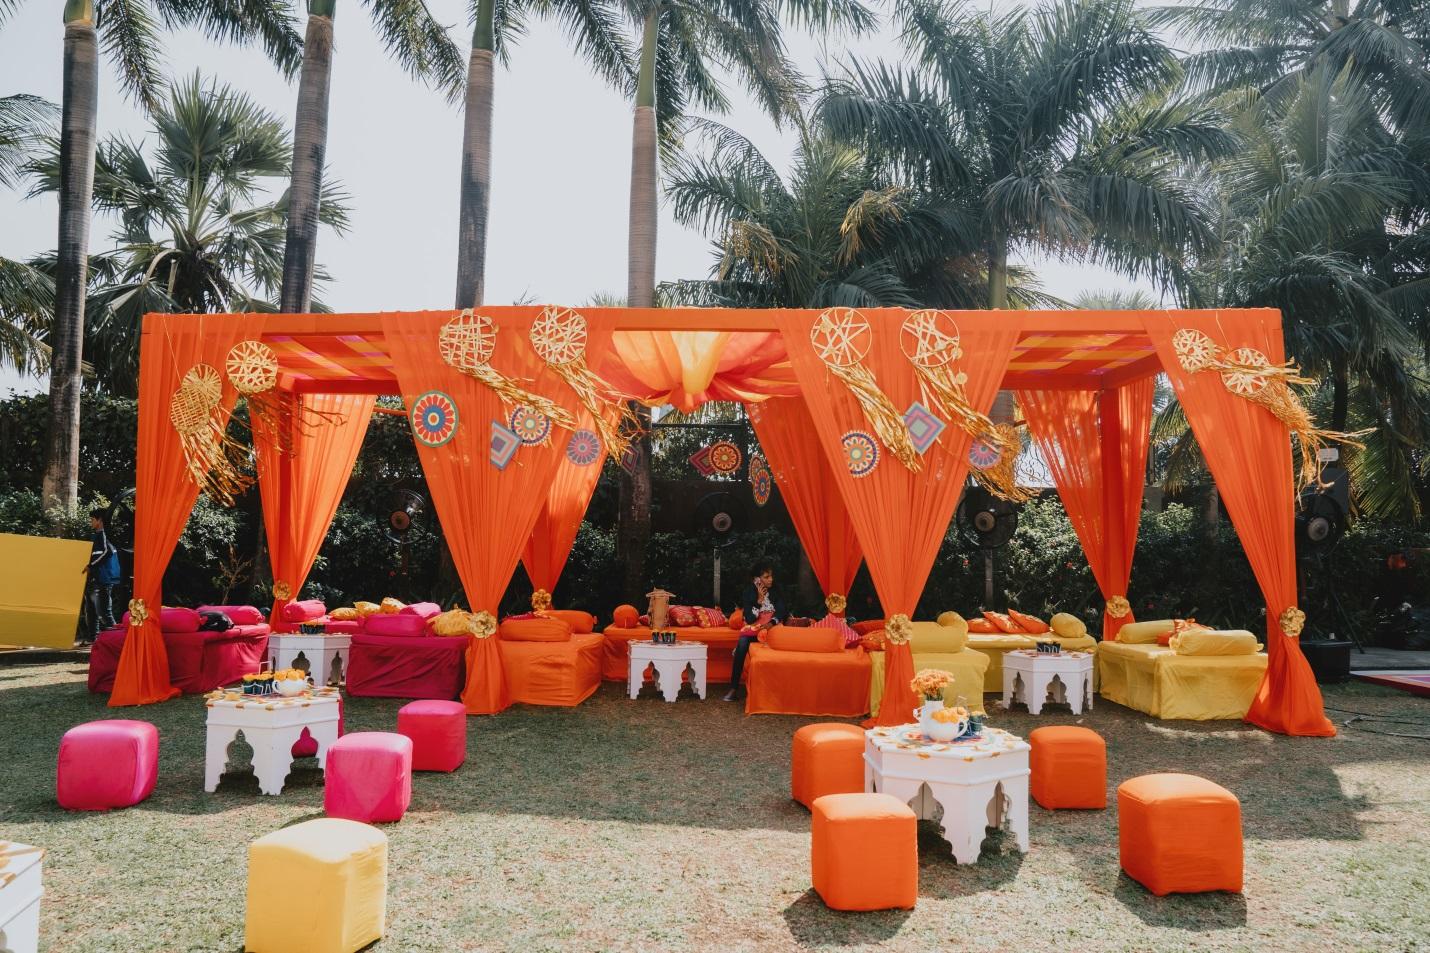 Decoration for haldi and mehendi ceremony